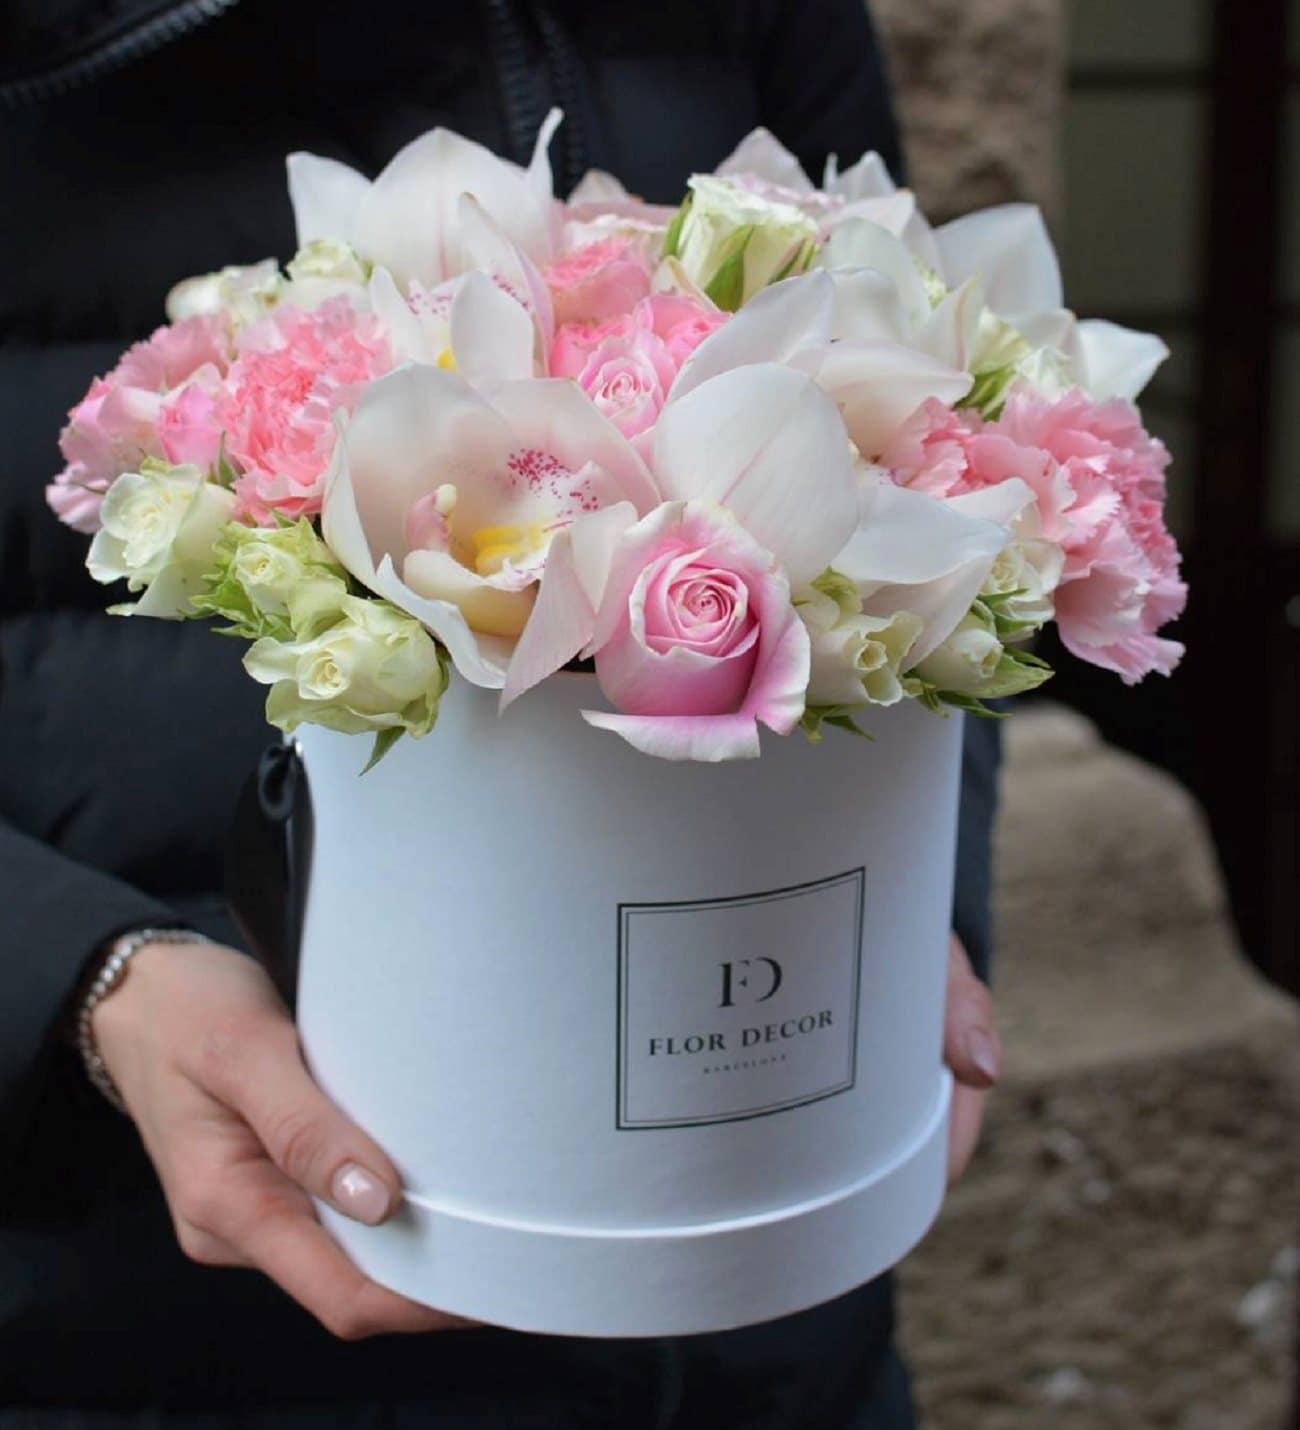 Valentine Pink Rose Floral Centrepiece 16cm One Size